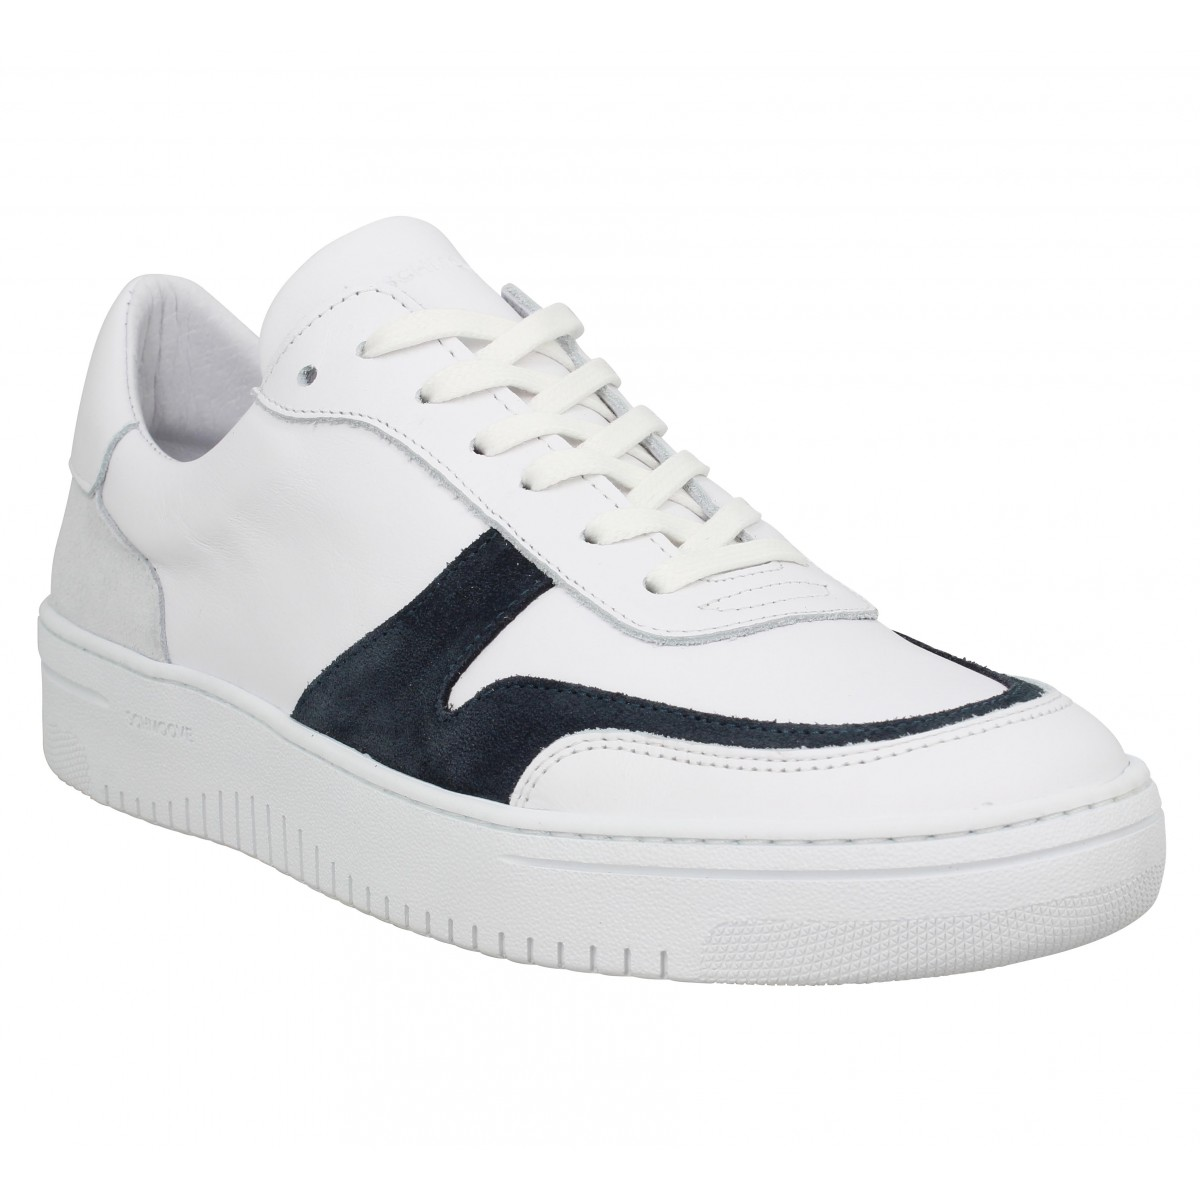 Baskets SCHMOOVE Evoc Sneaker cuir Homme Blanc